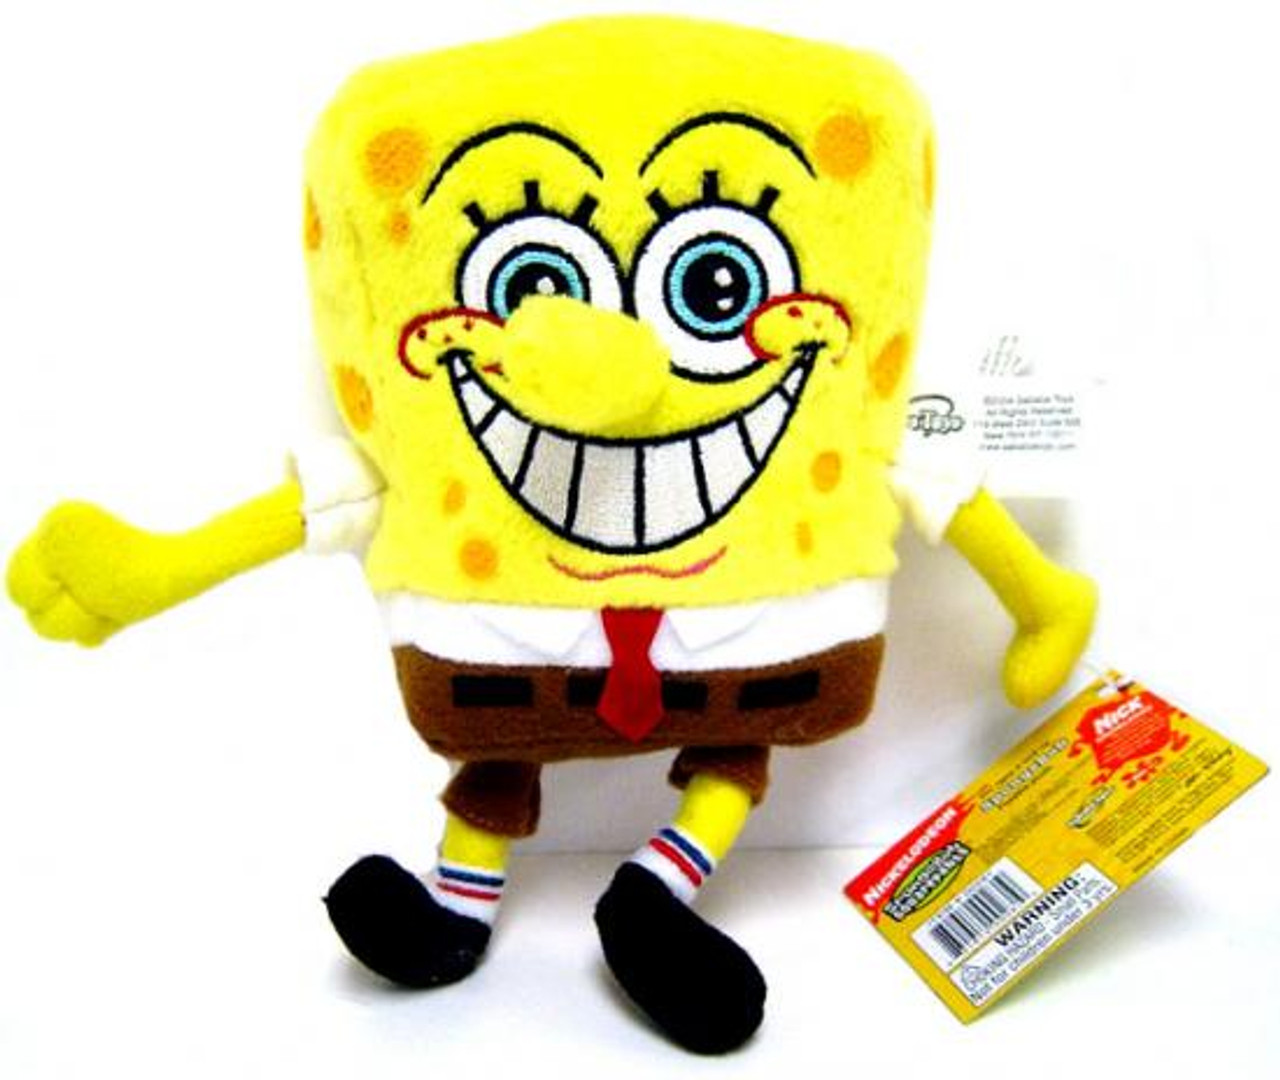 Spongebob Squarepants Spongebob 5-Inch Plush Figure